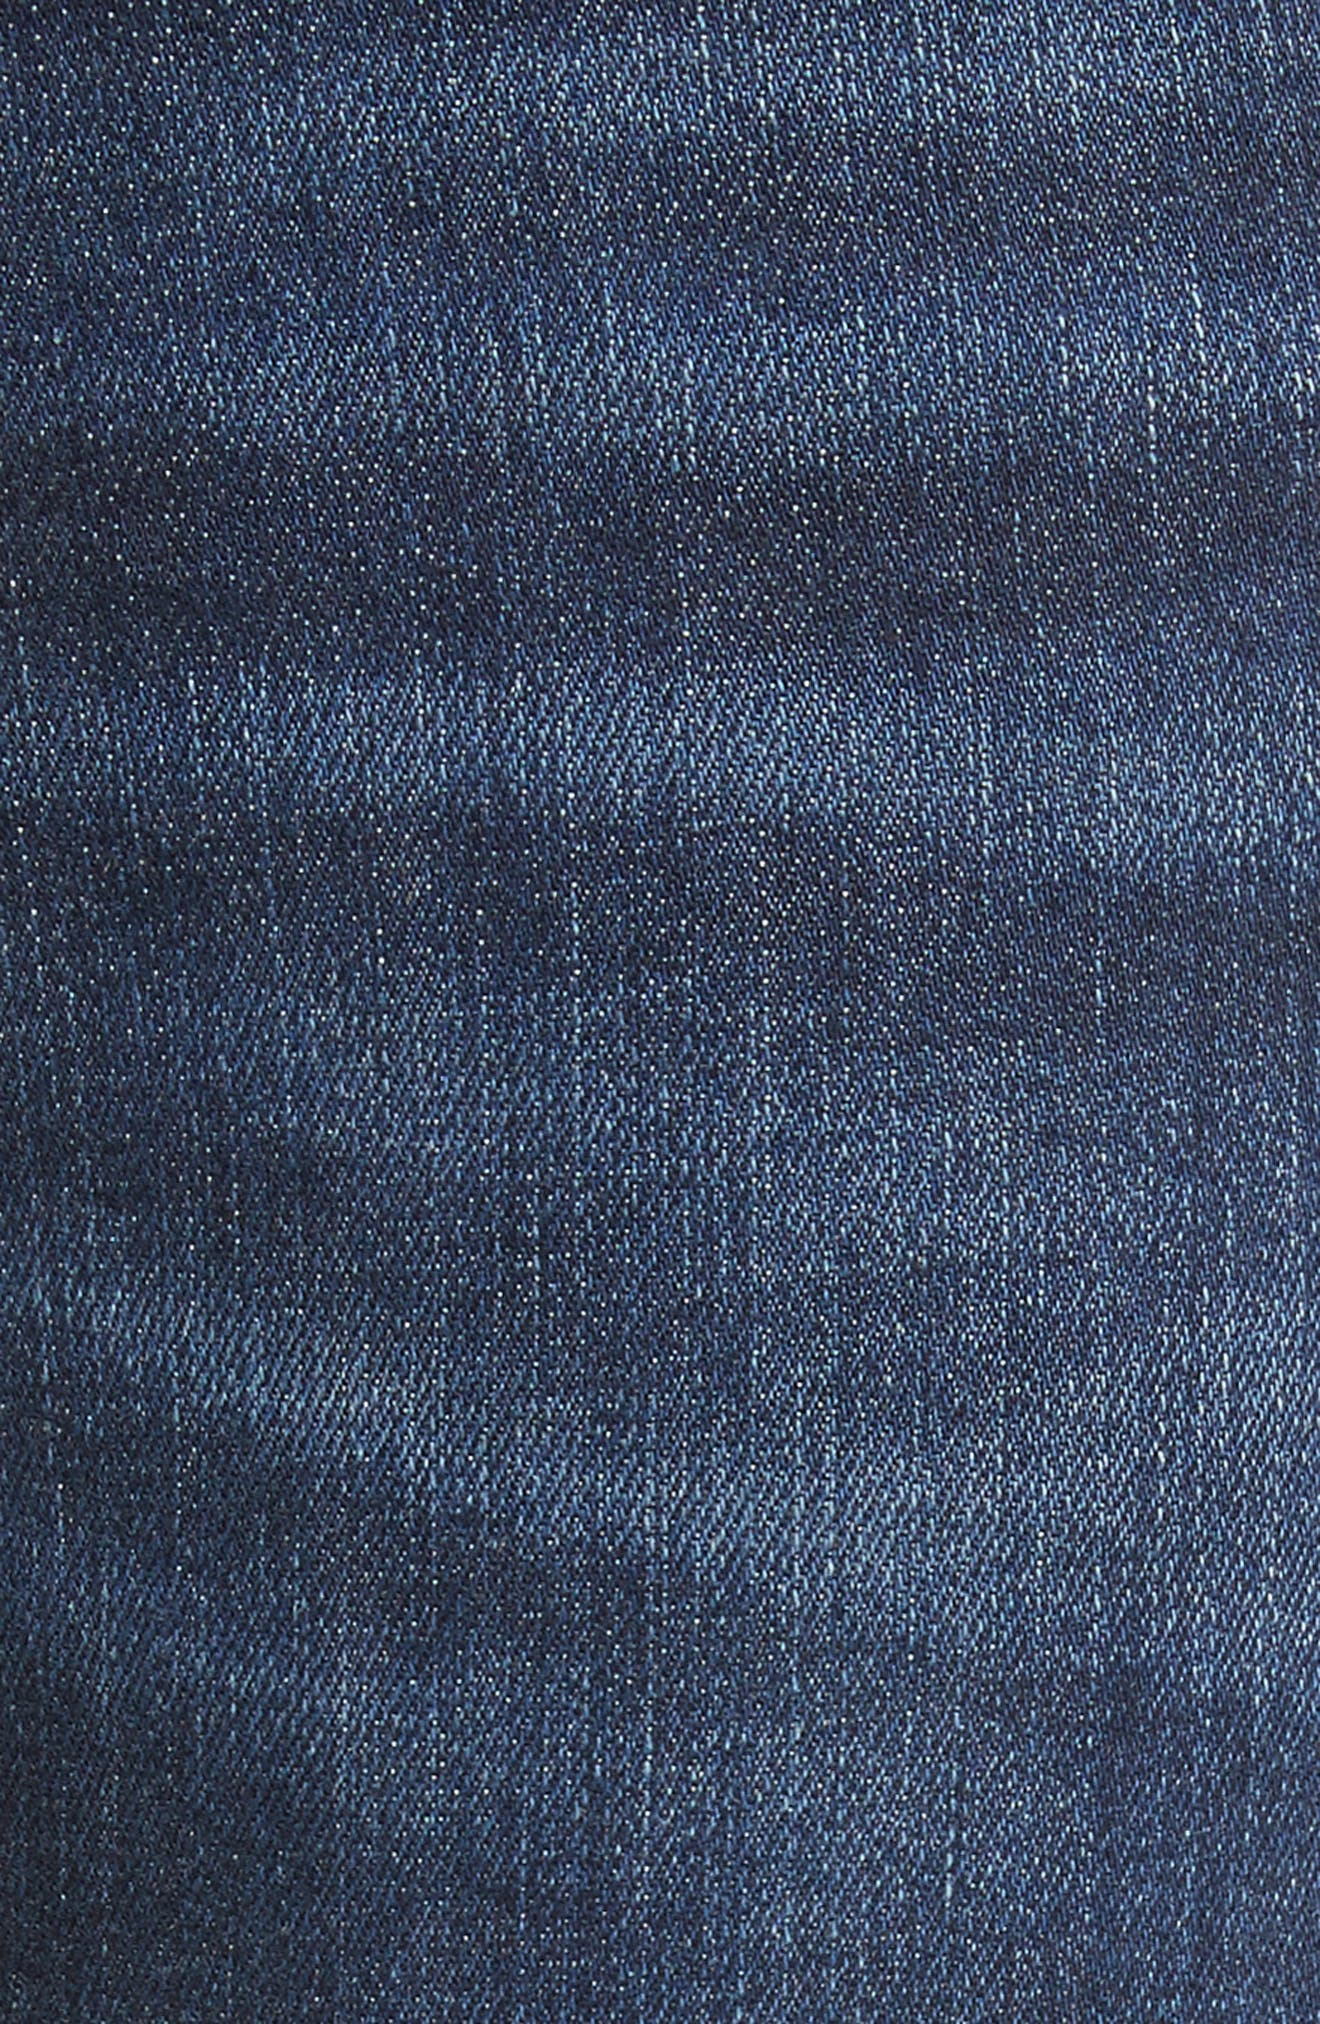 Ankle Skinny Jeans,                             Alternate thumbnail 5, color,                             Indigo Raven With Release Hem